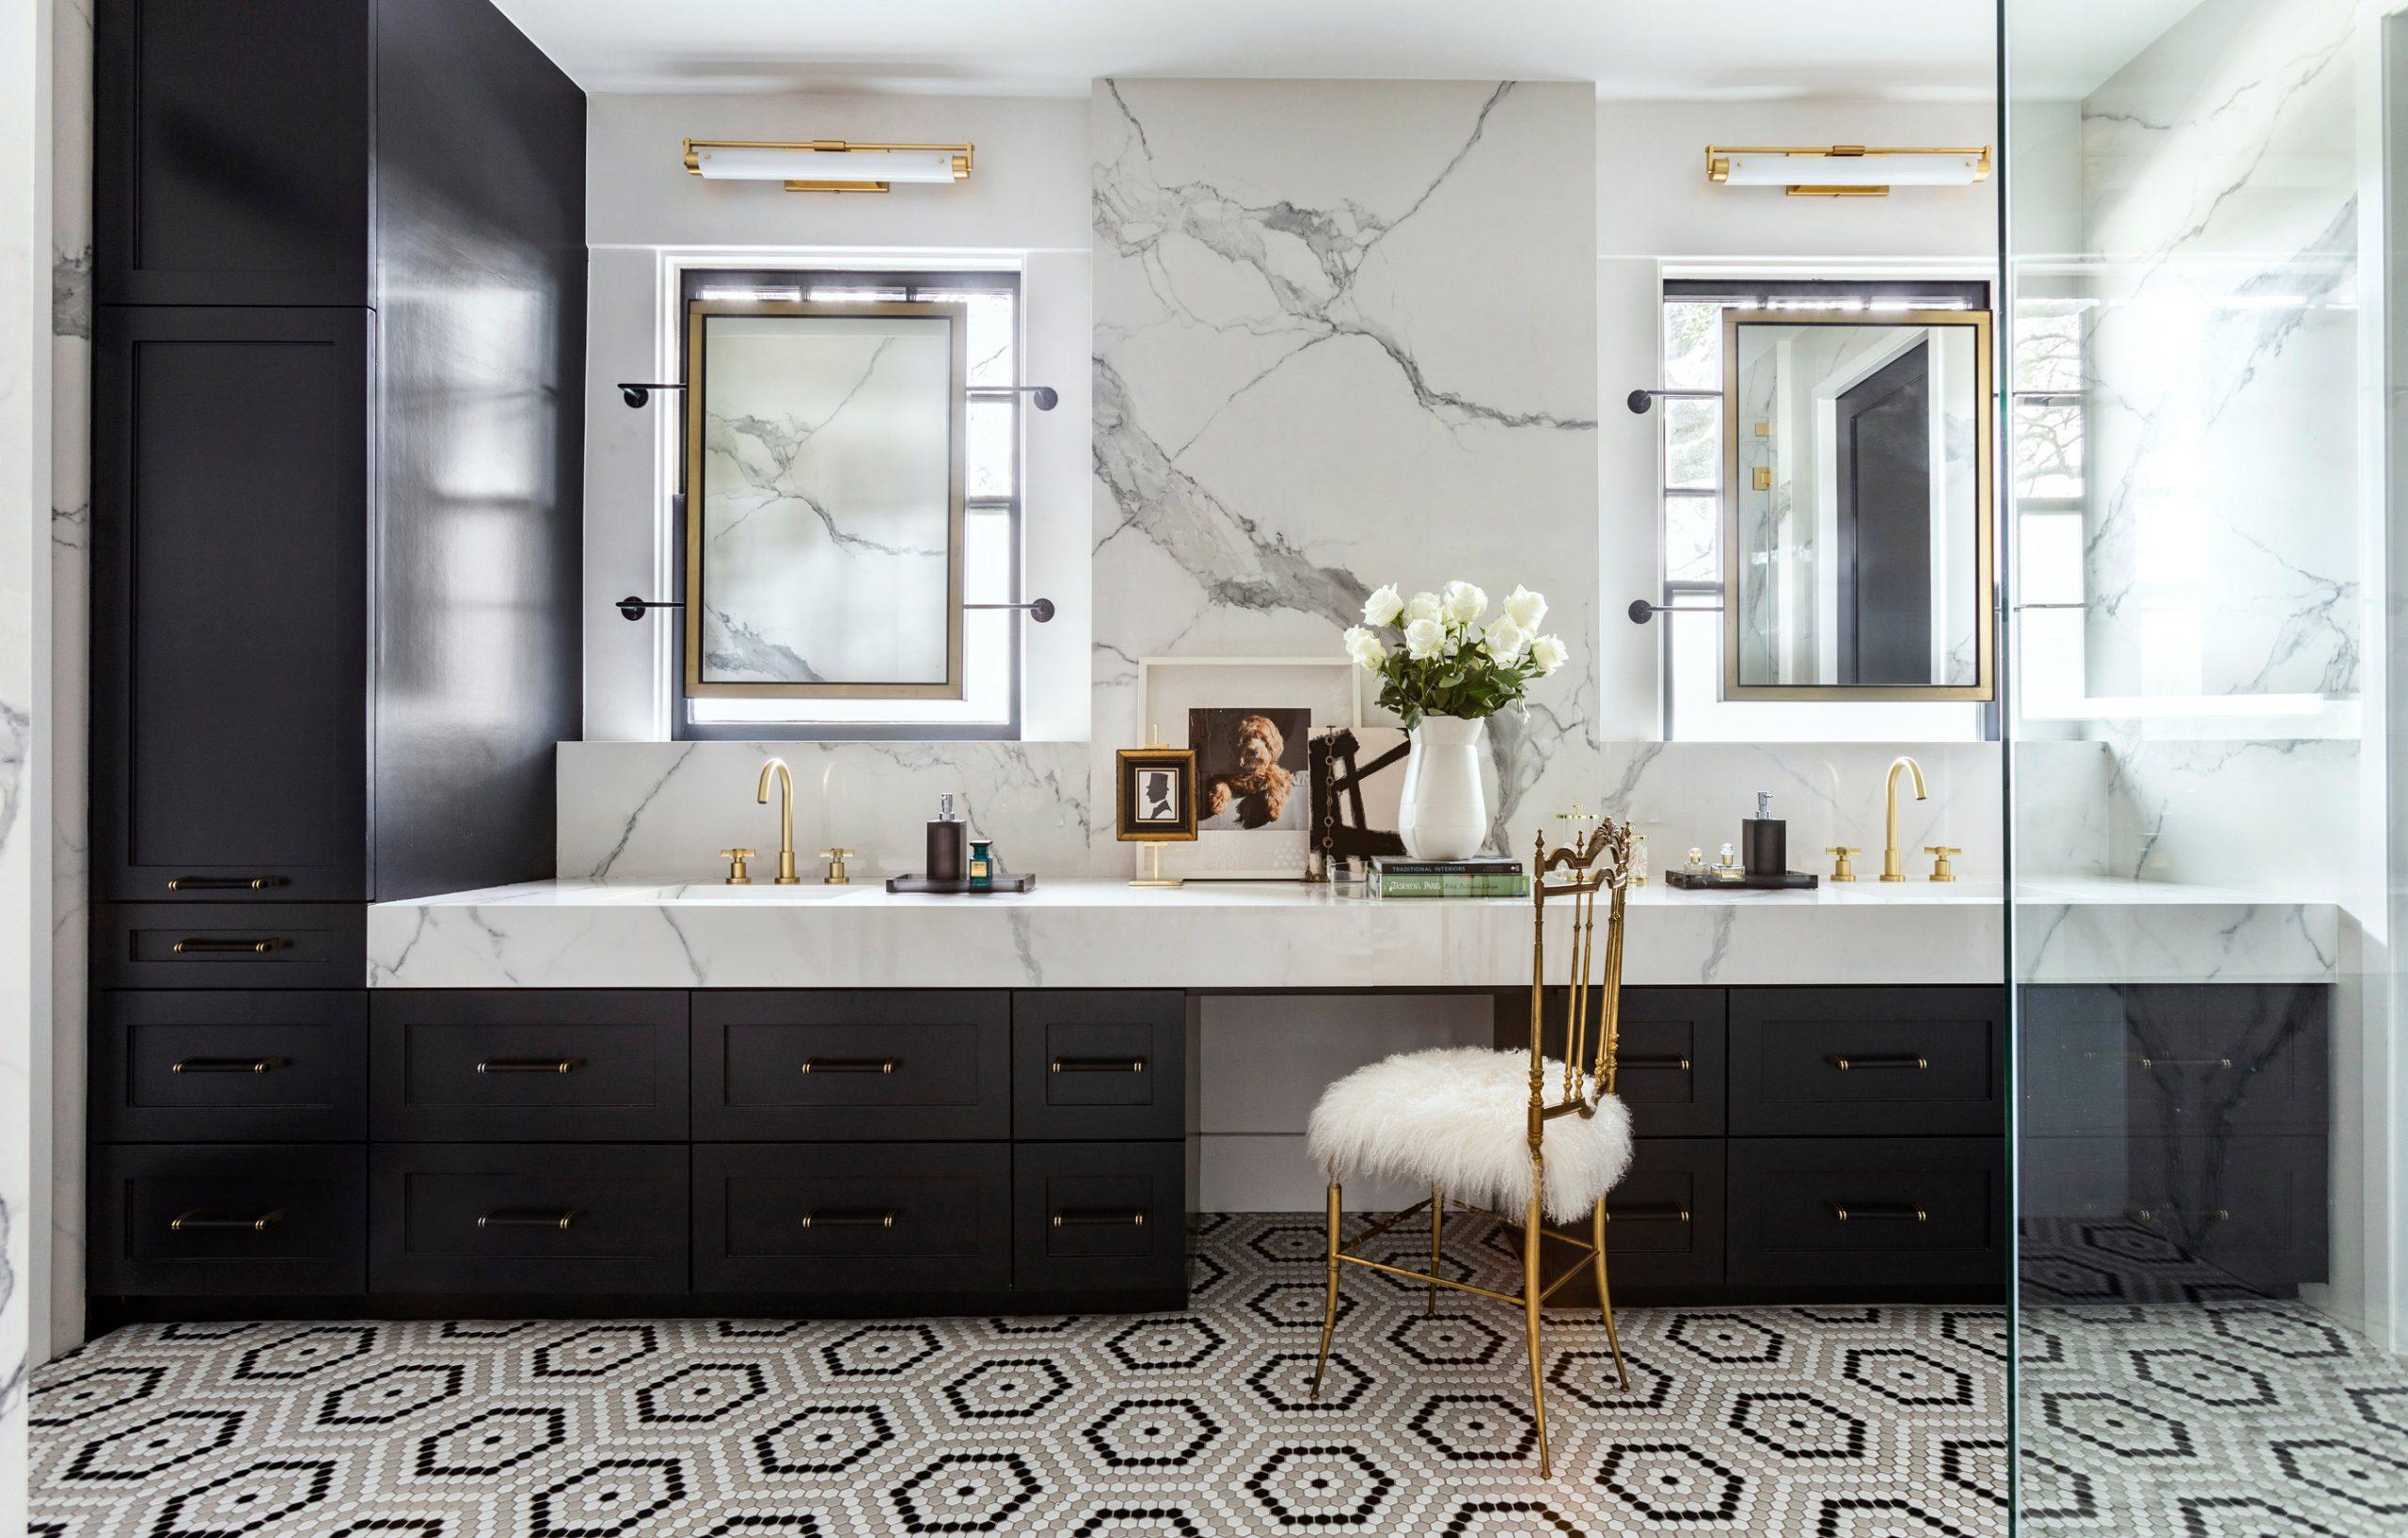 Bathroom design with tile flooring - Creative tonic